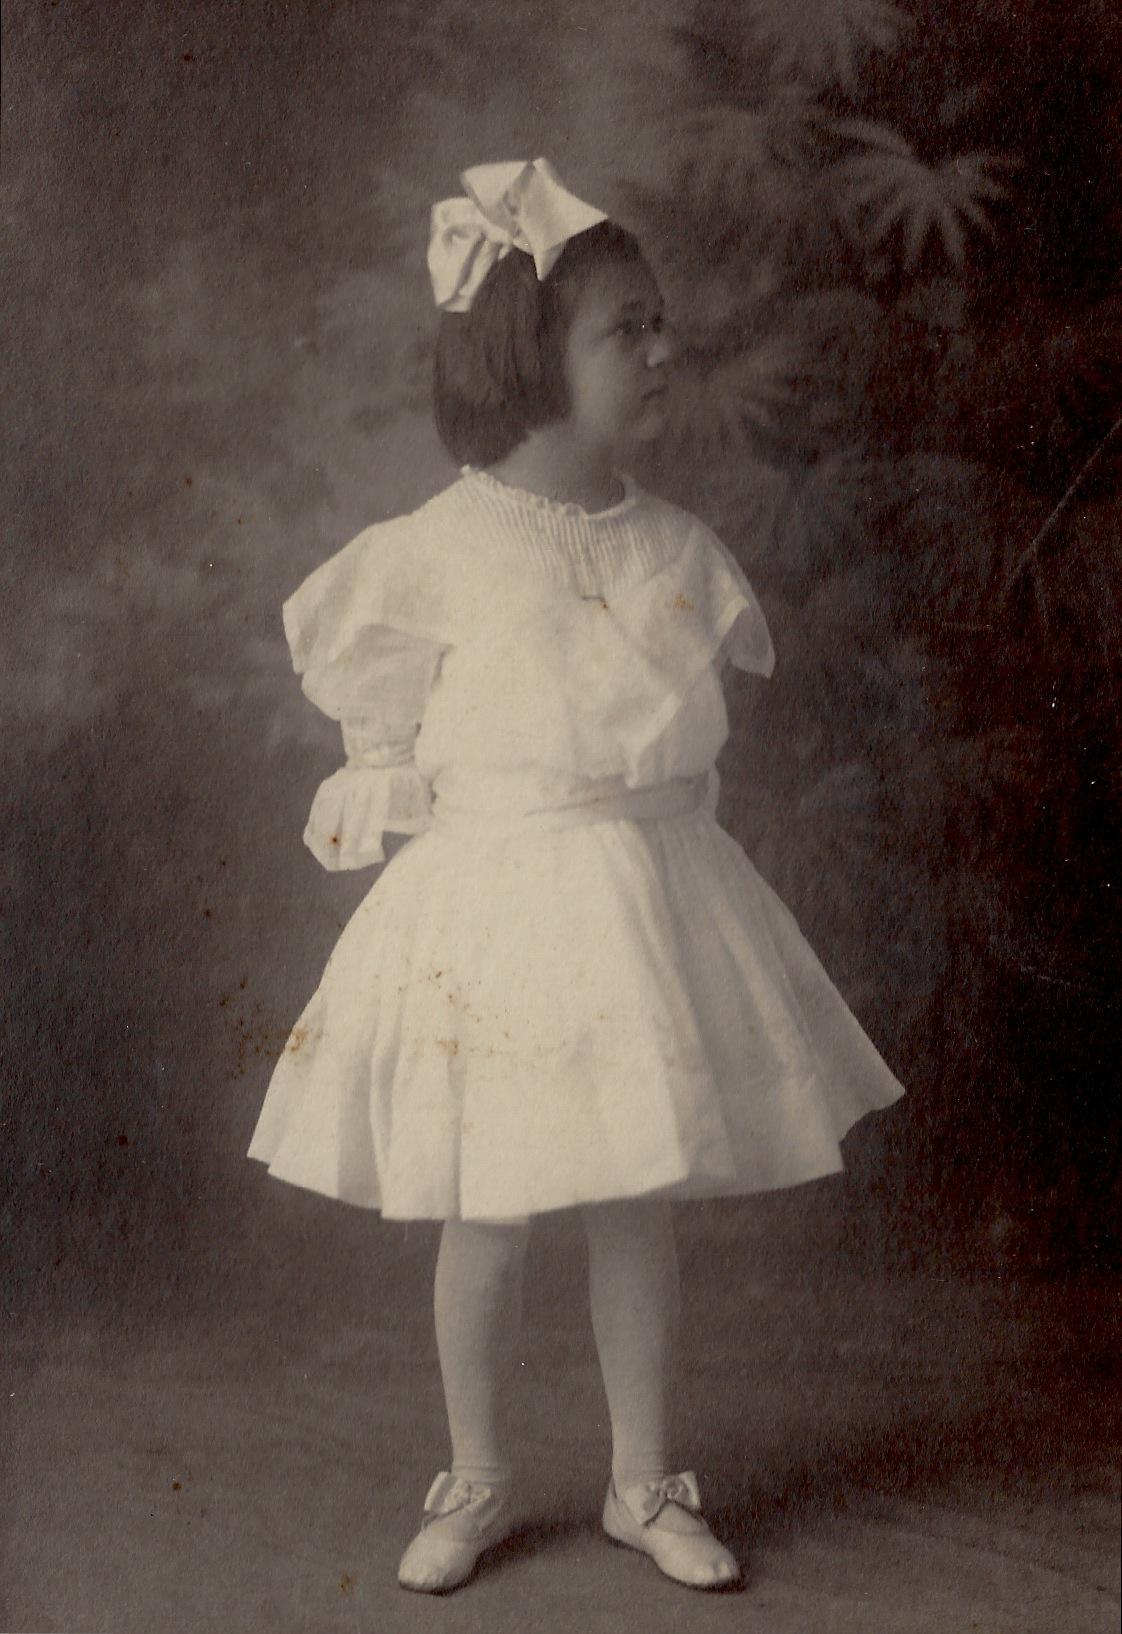 Honeywood Parrish Rouse, ca. 1905